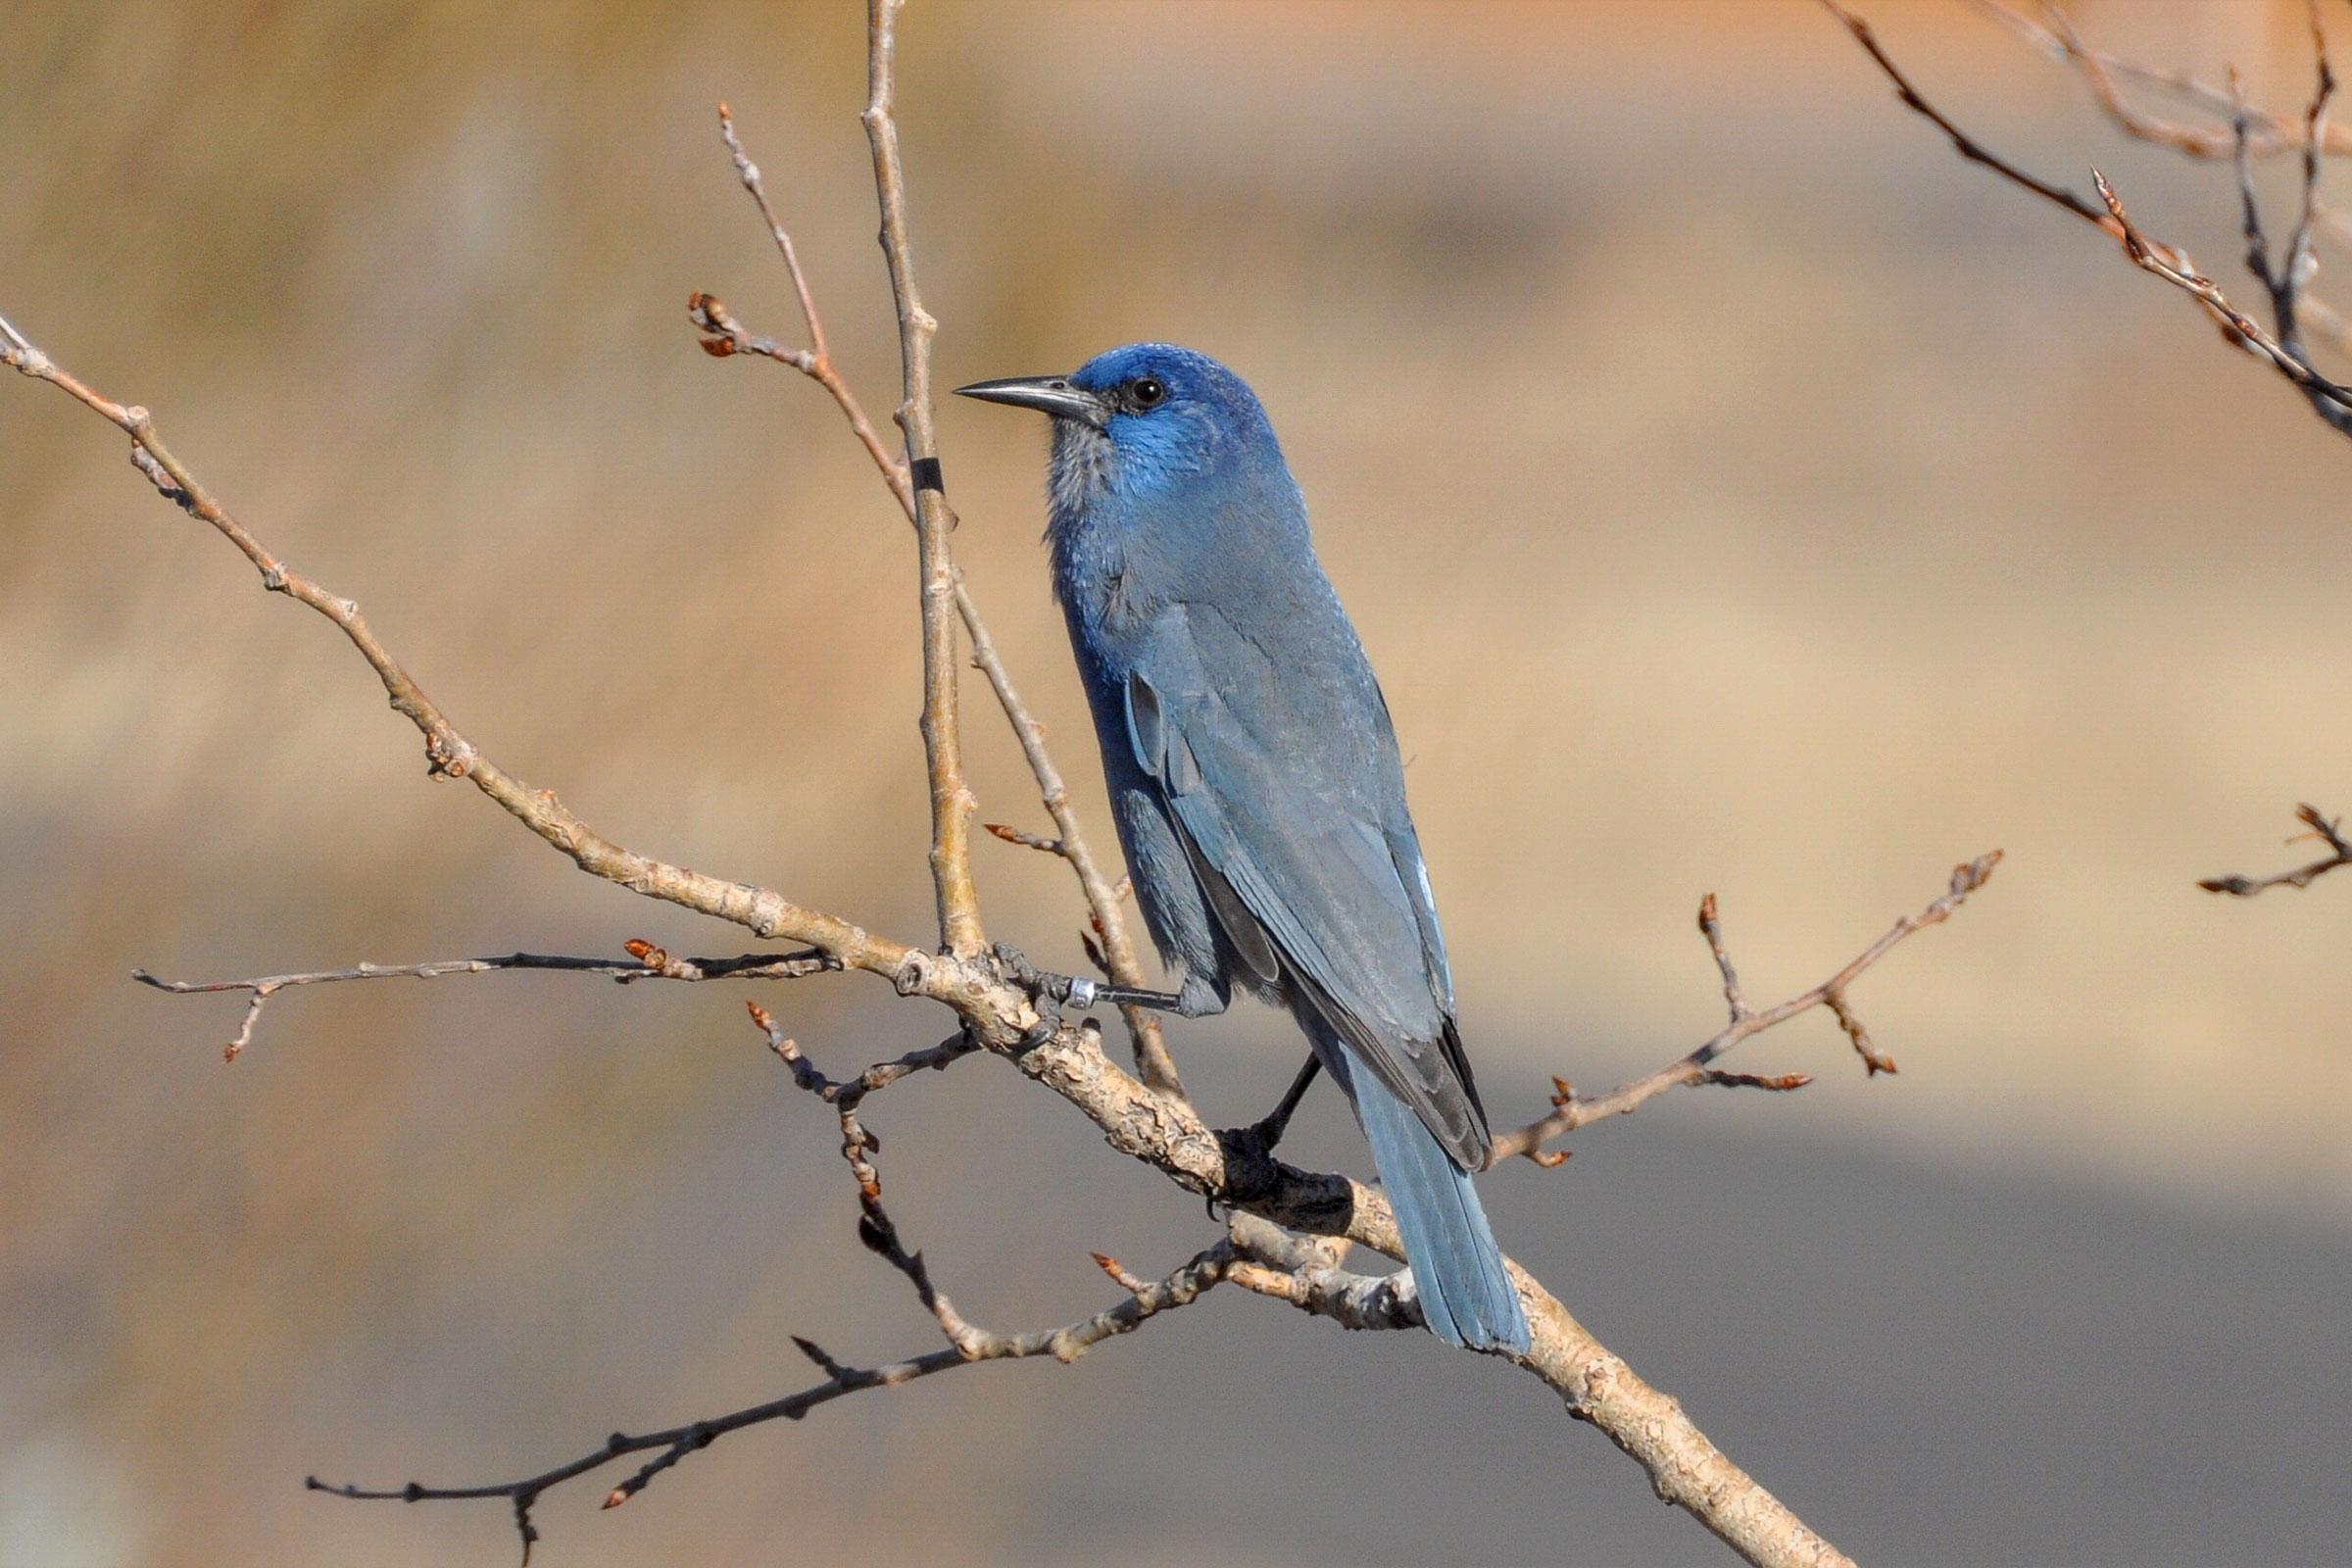 Pinyon Jay. Pam Koch/Great Backyard Bird Count